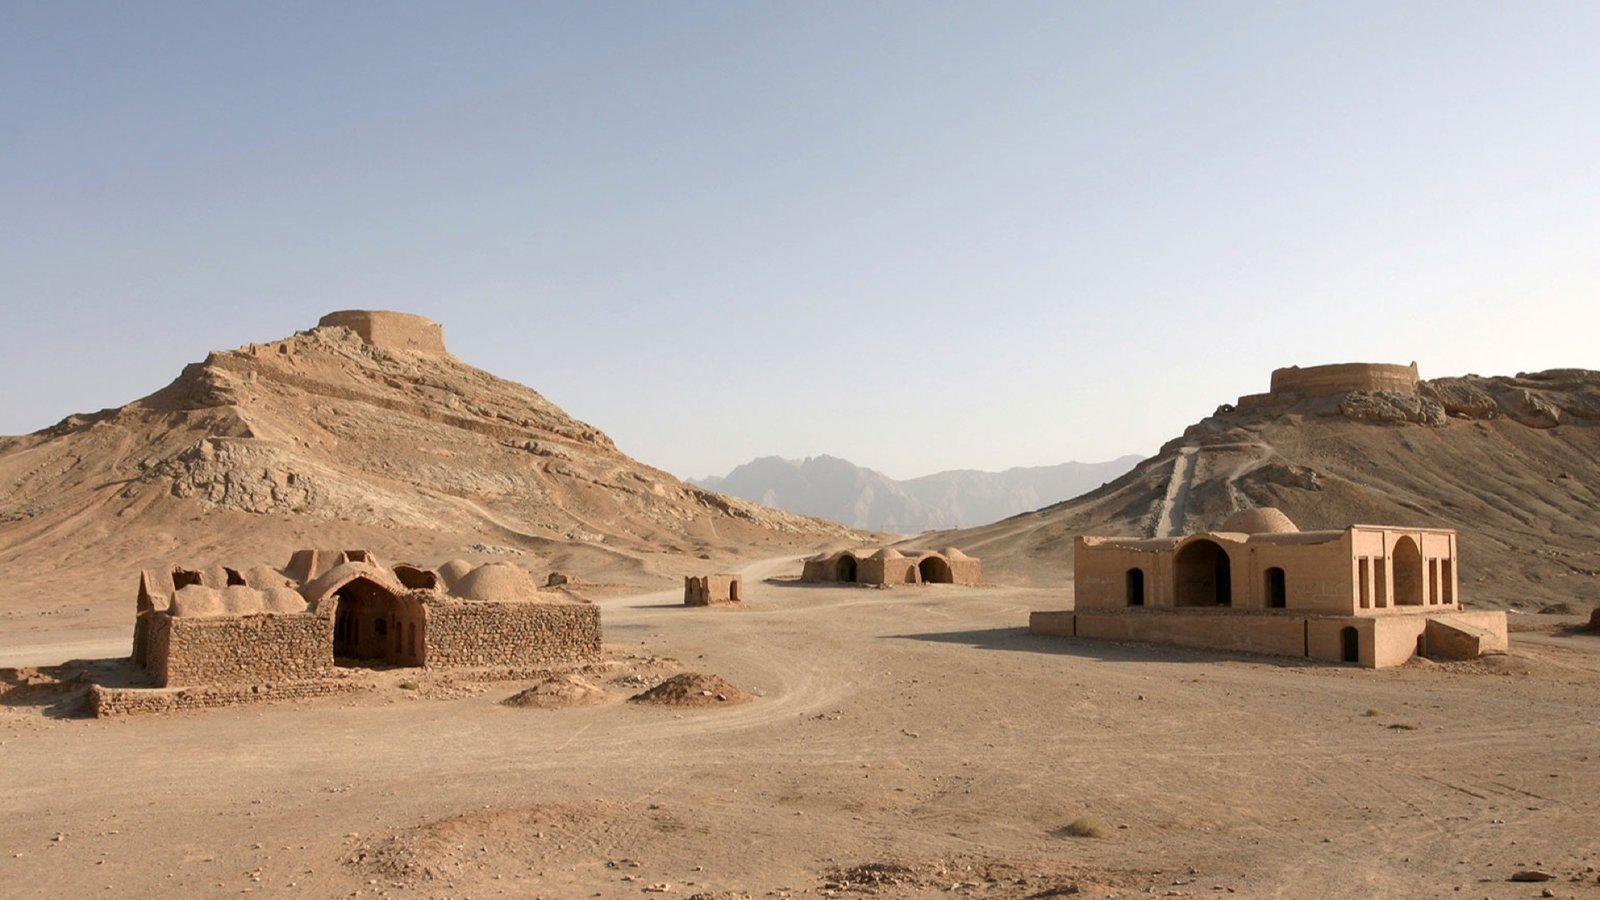 Related Traditions - Zoroastrian Scriptures